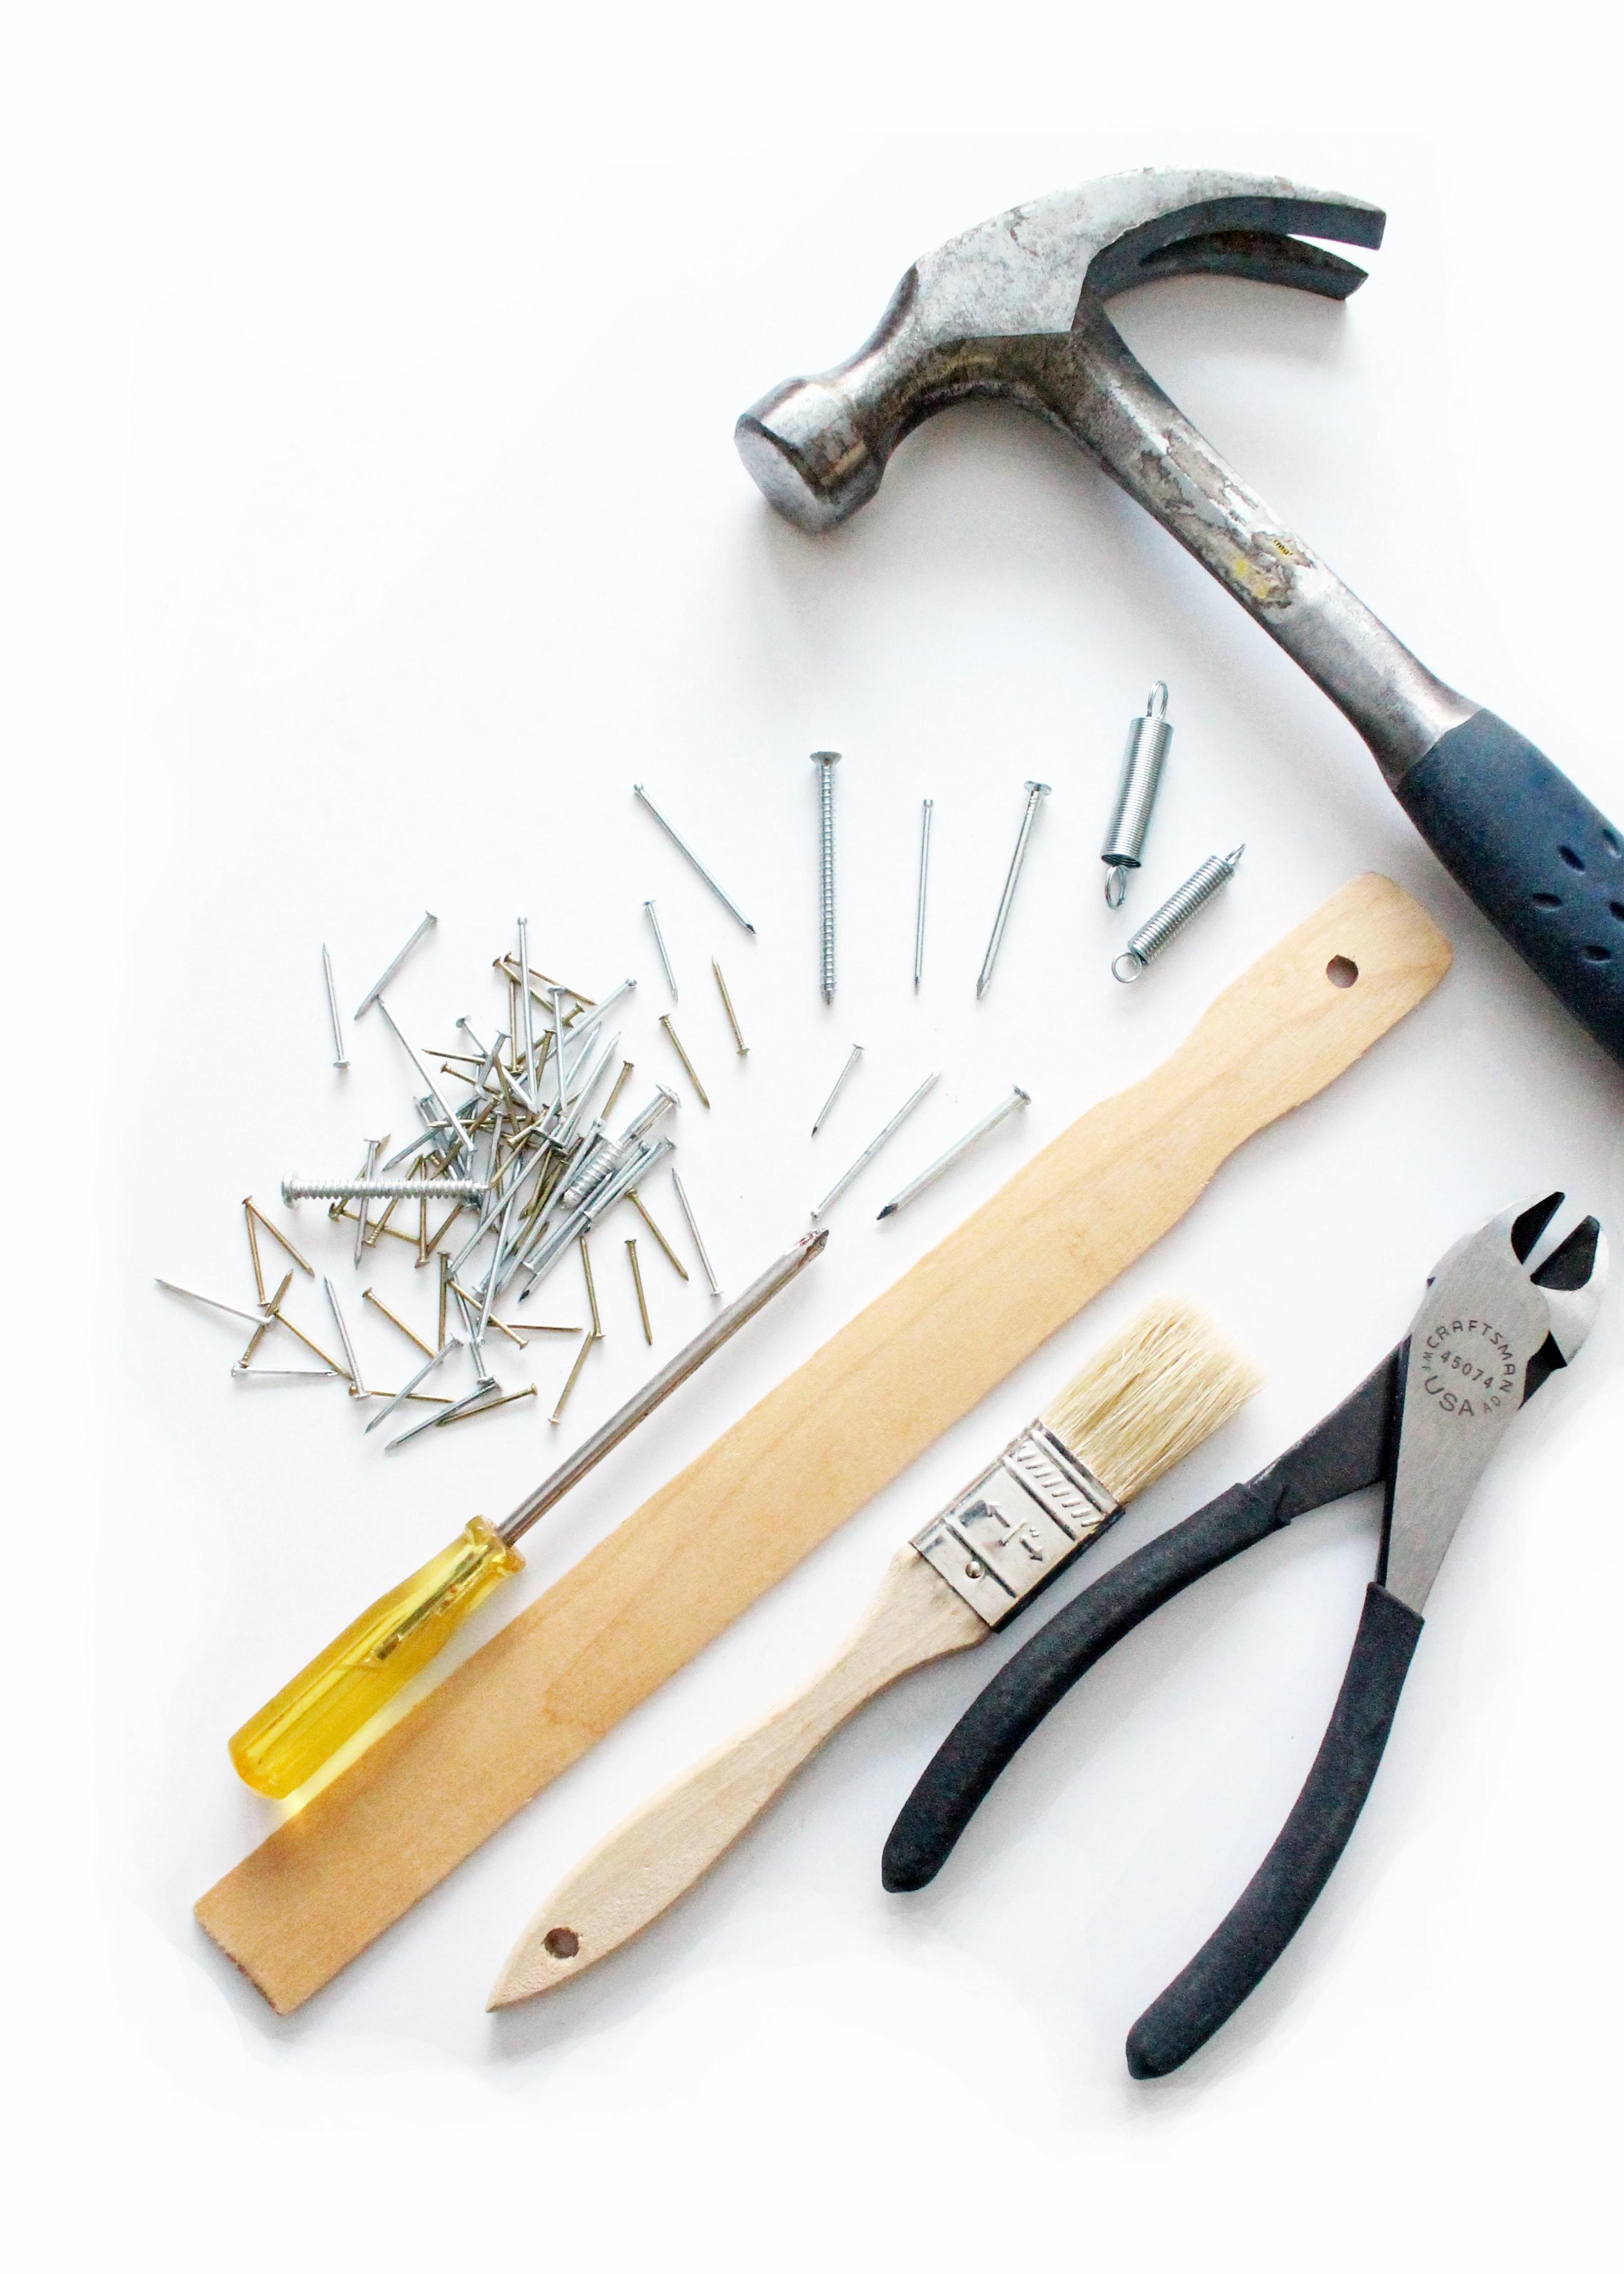 Repair of other equipment in Tartu county